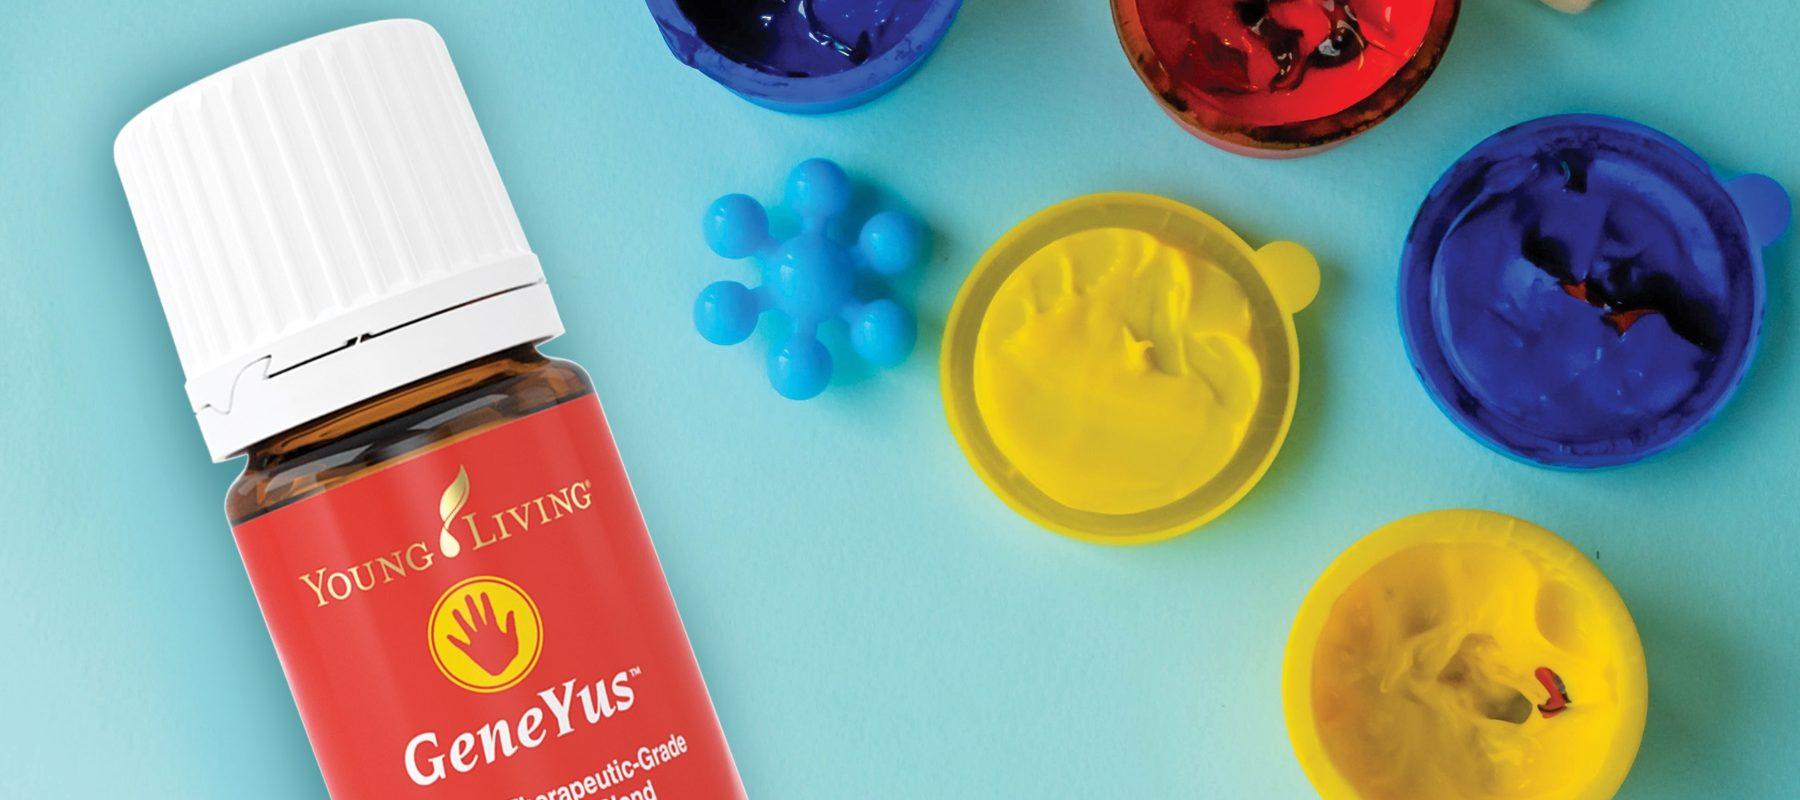 KidScents Favs: GeneYus and Owie